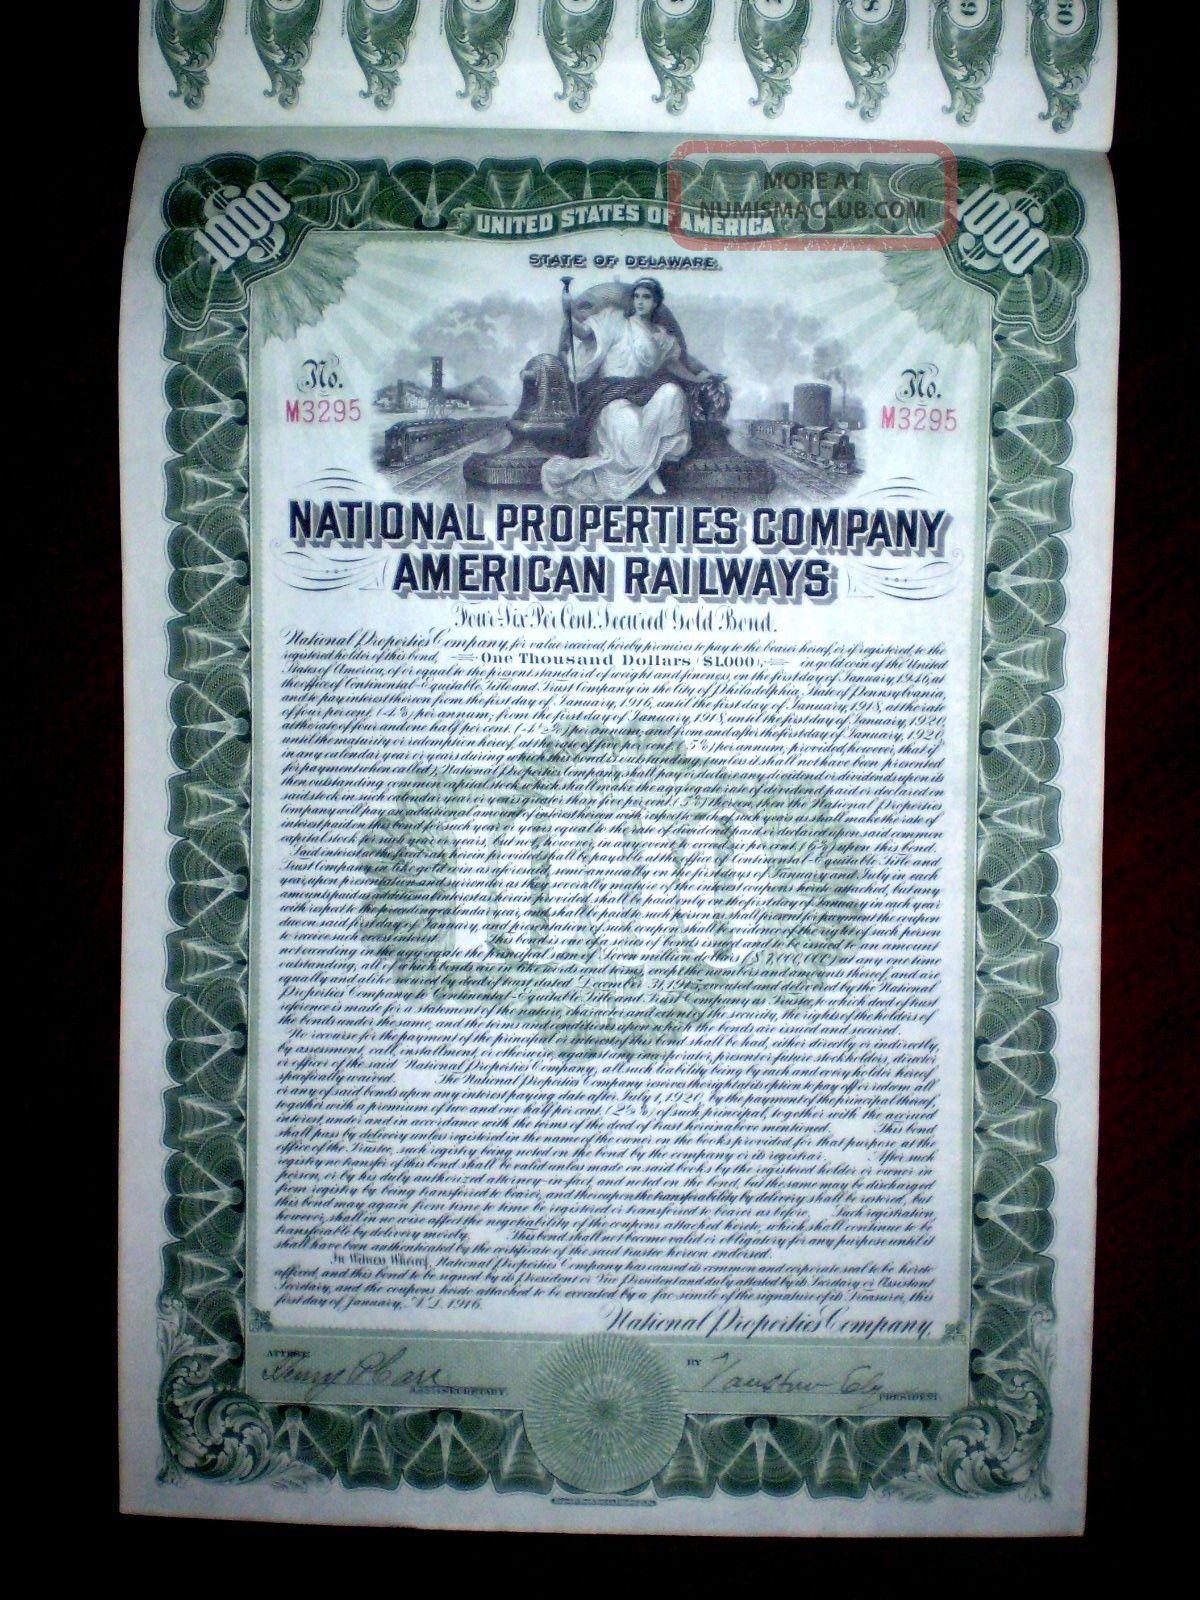 National Properties Company American Railways $1000 Gold Bond 1916 Stocks & Bonds, Scripophily photo